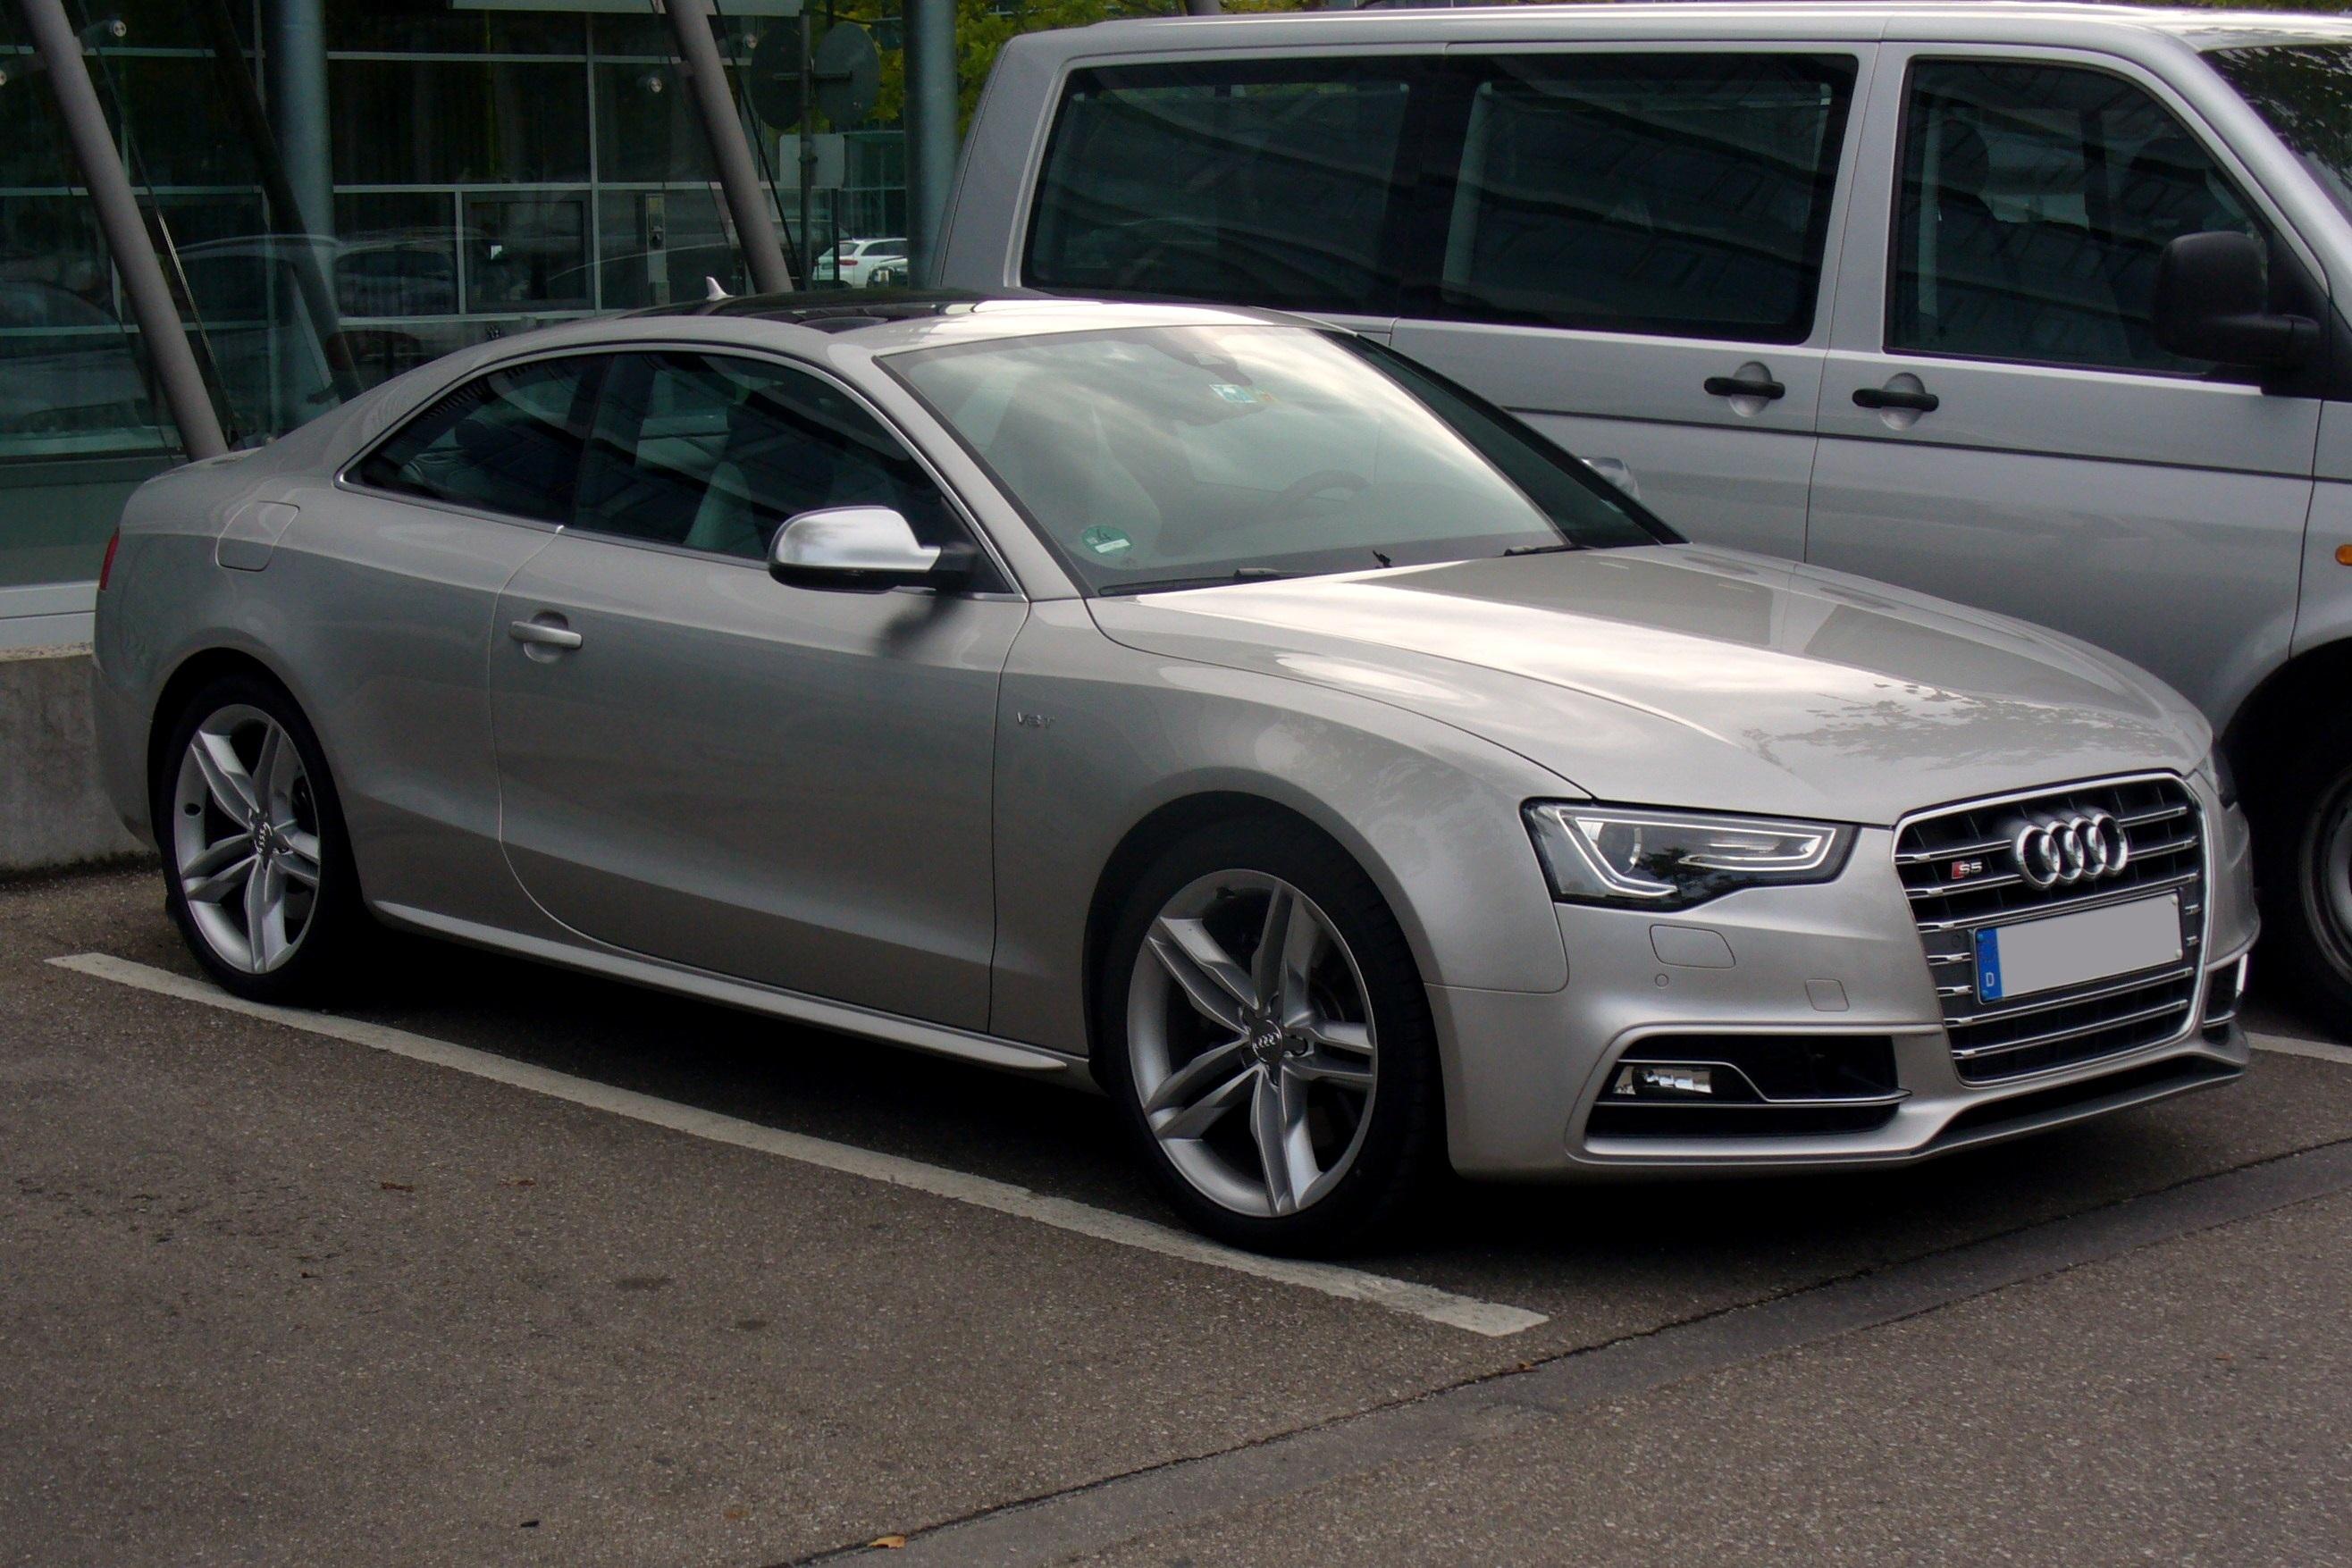 Audi s5 coupe technical details history photos on better parts ltd audi s5 coupe photo 10 sciox Choice Image